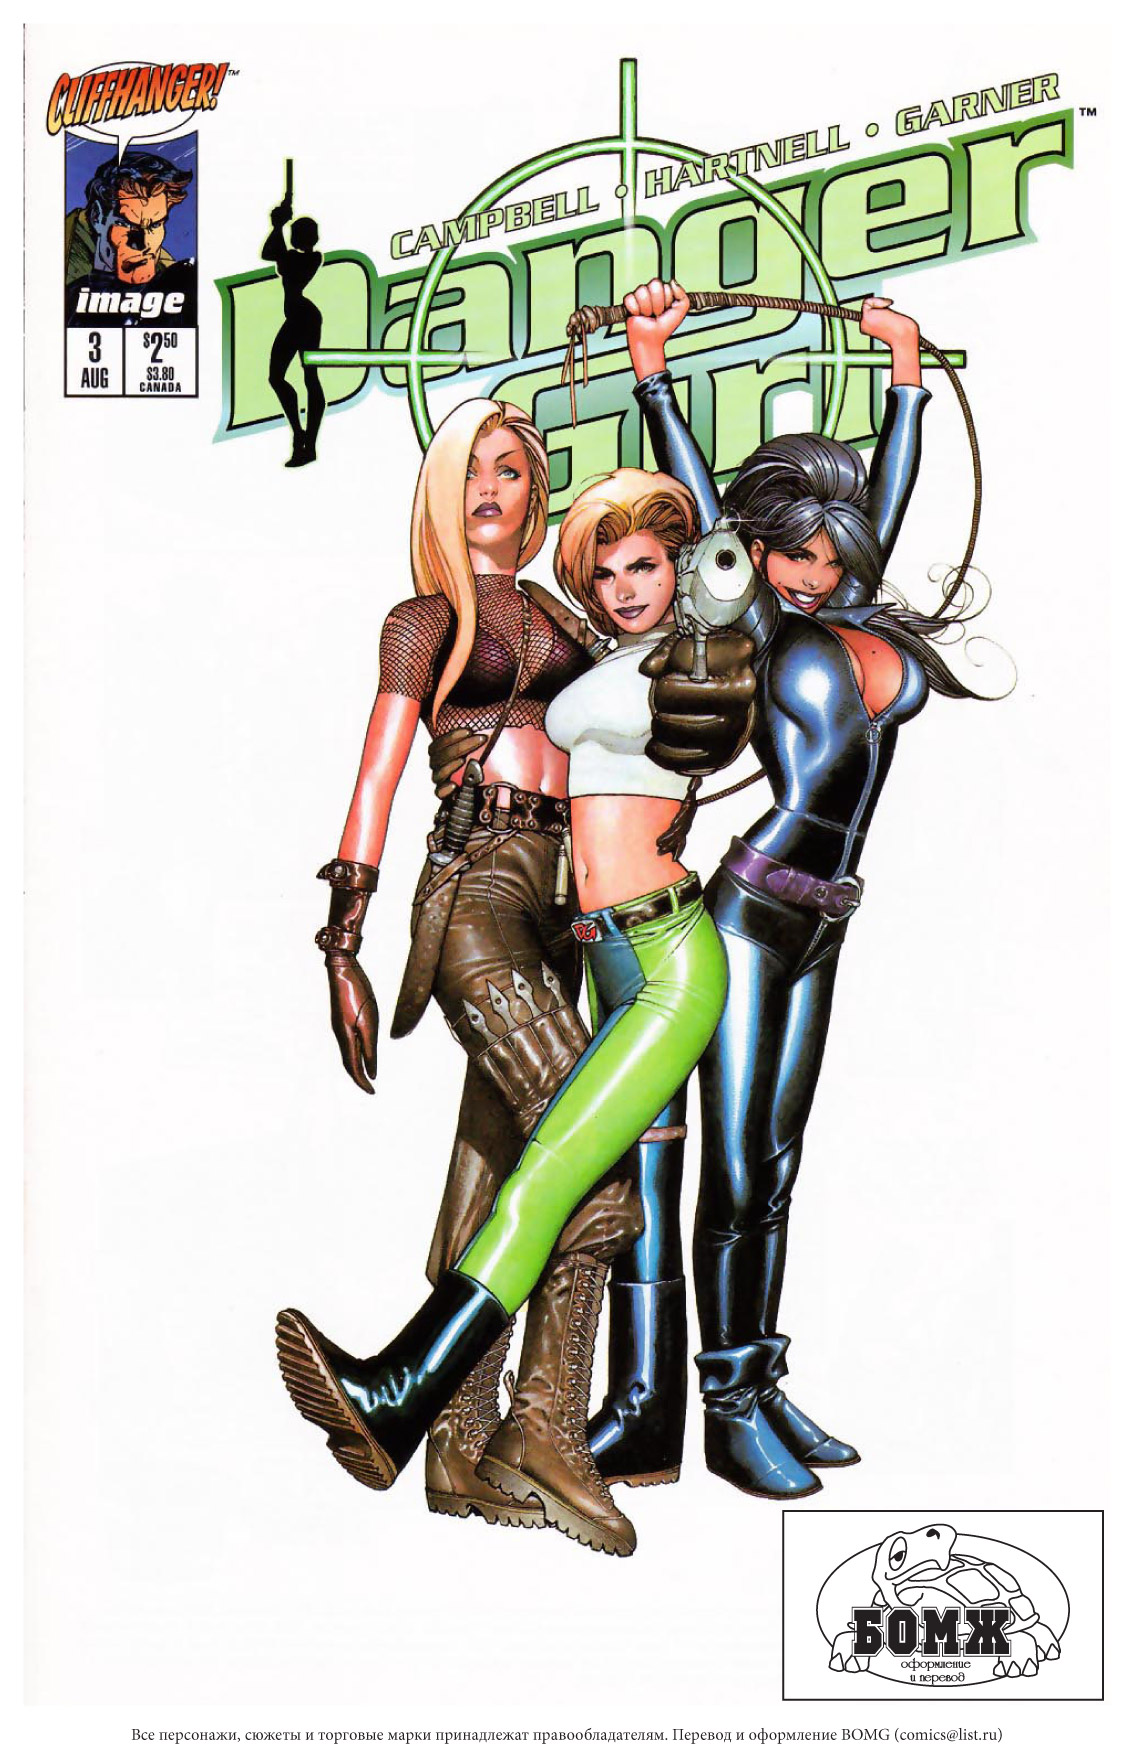 Bedlam #3 (2nd printing variant cover) image comics yazar: nick spencer 0c7izer: riley rossmo